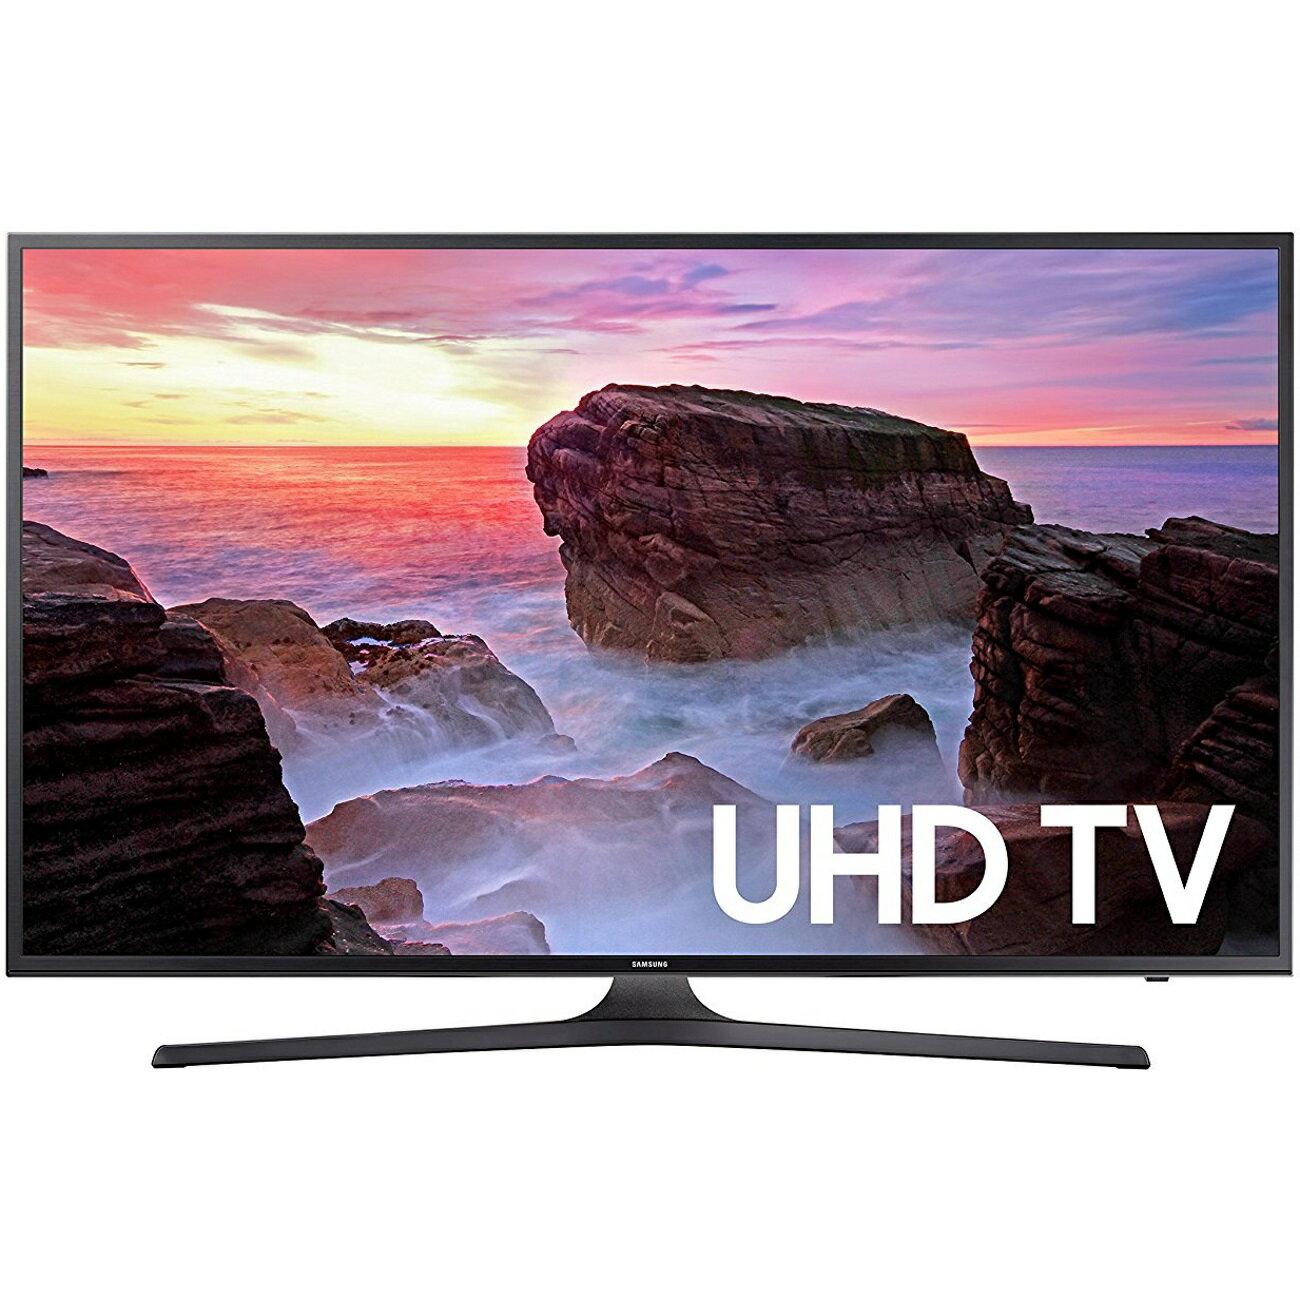 Samsung UN65MU6300FXZA 65 4K HDR Ultra HD Smart LED TV (2017 Model) 1